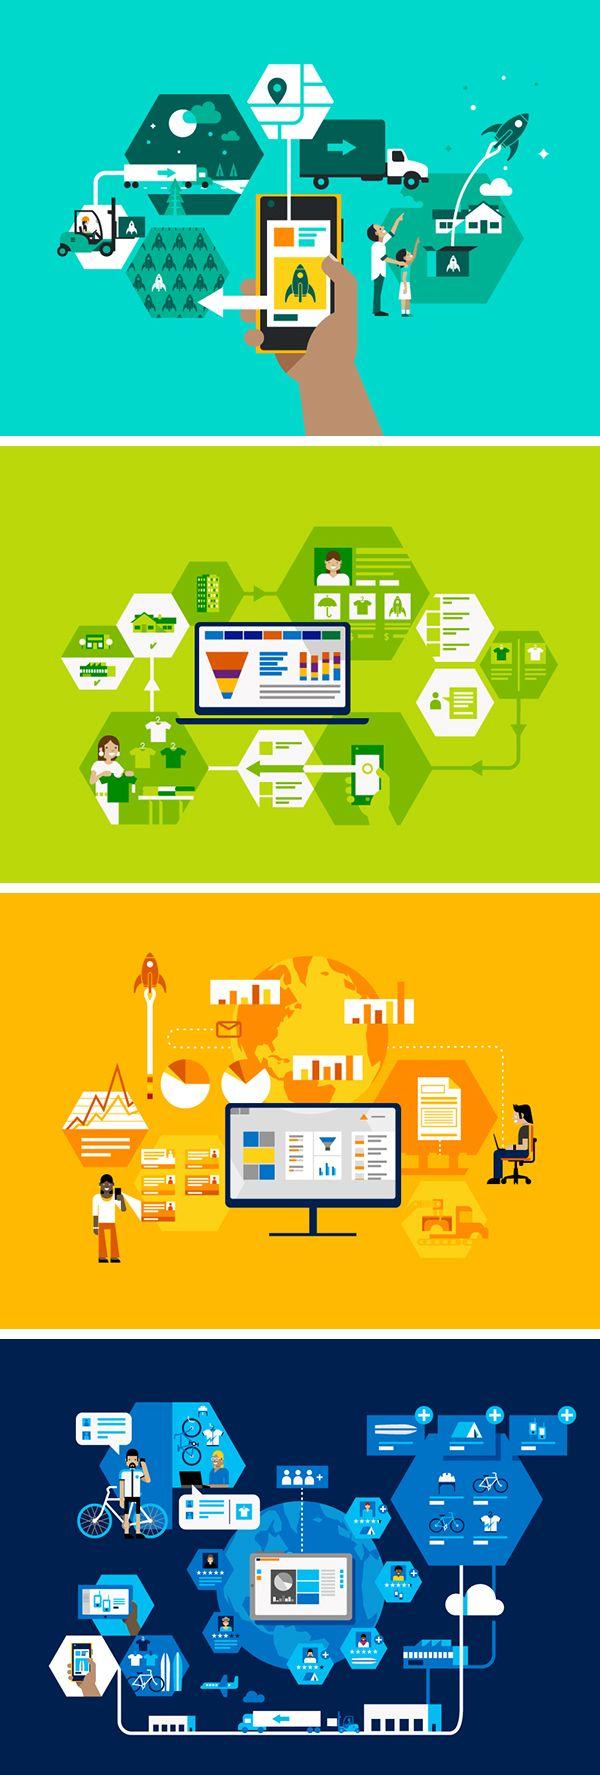 Microsoft Dynamics Illustrations